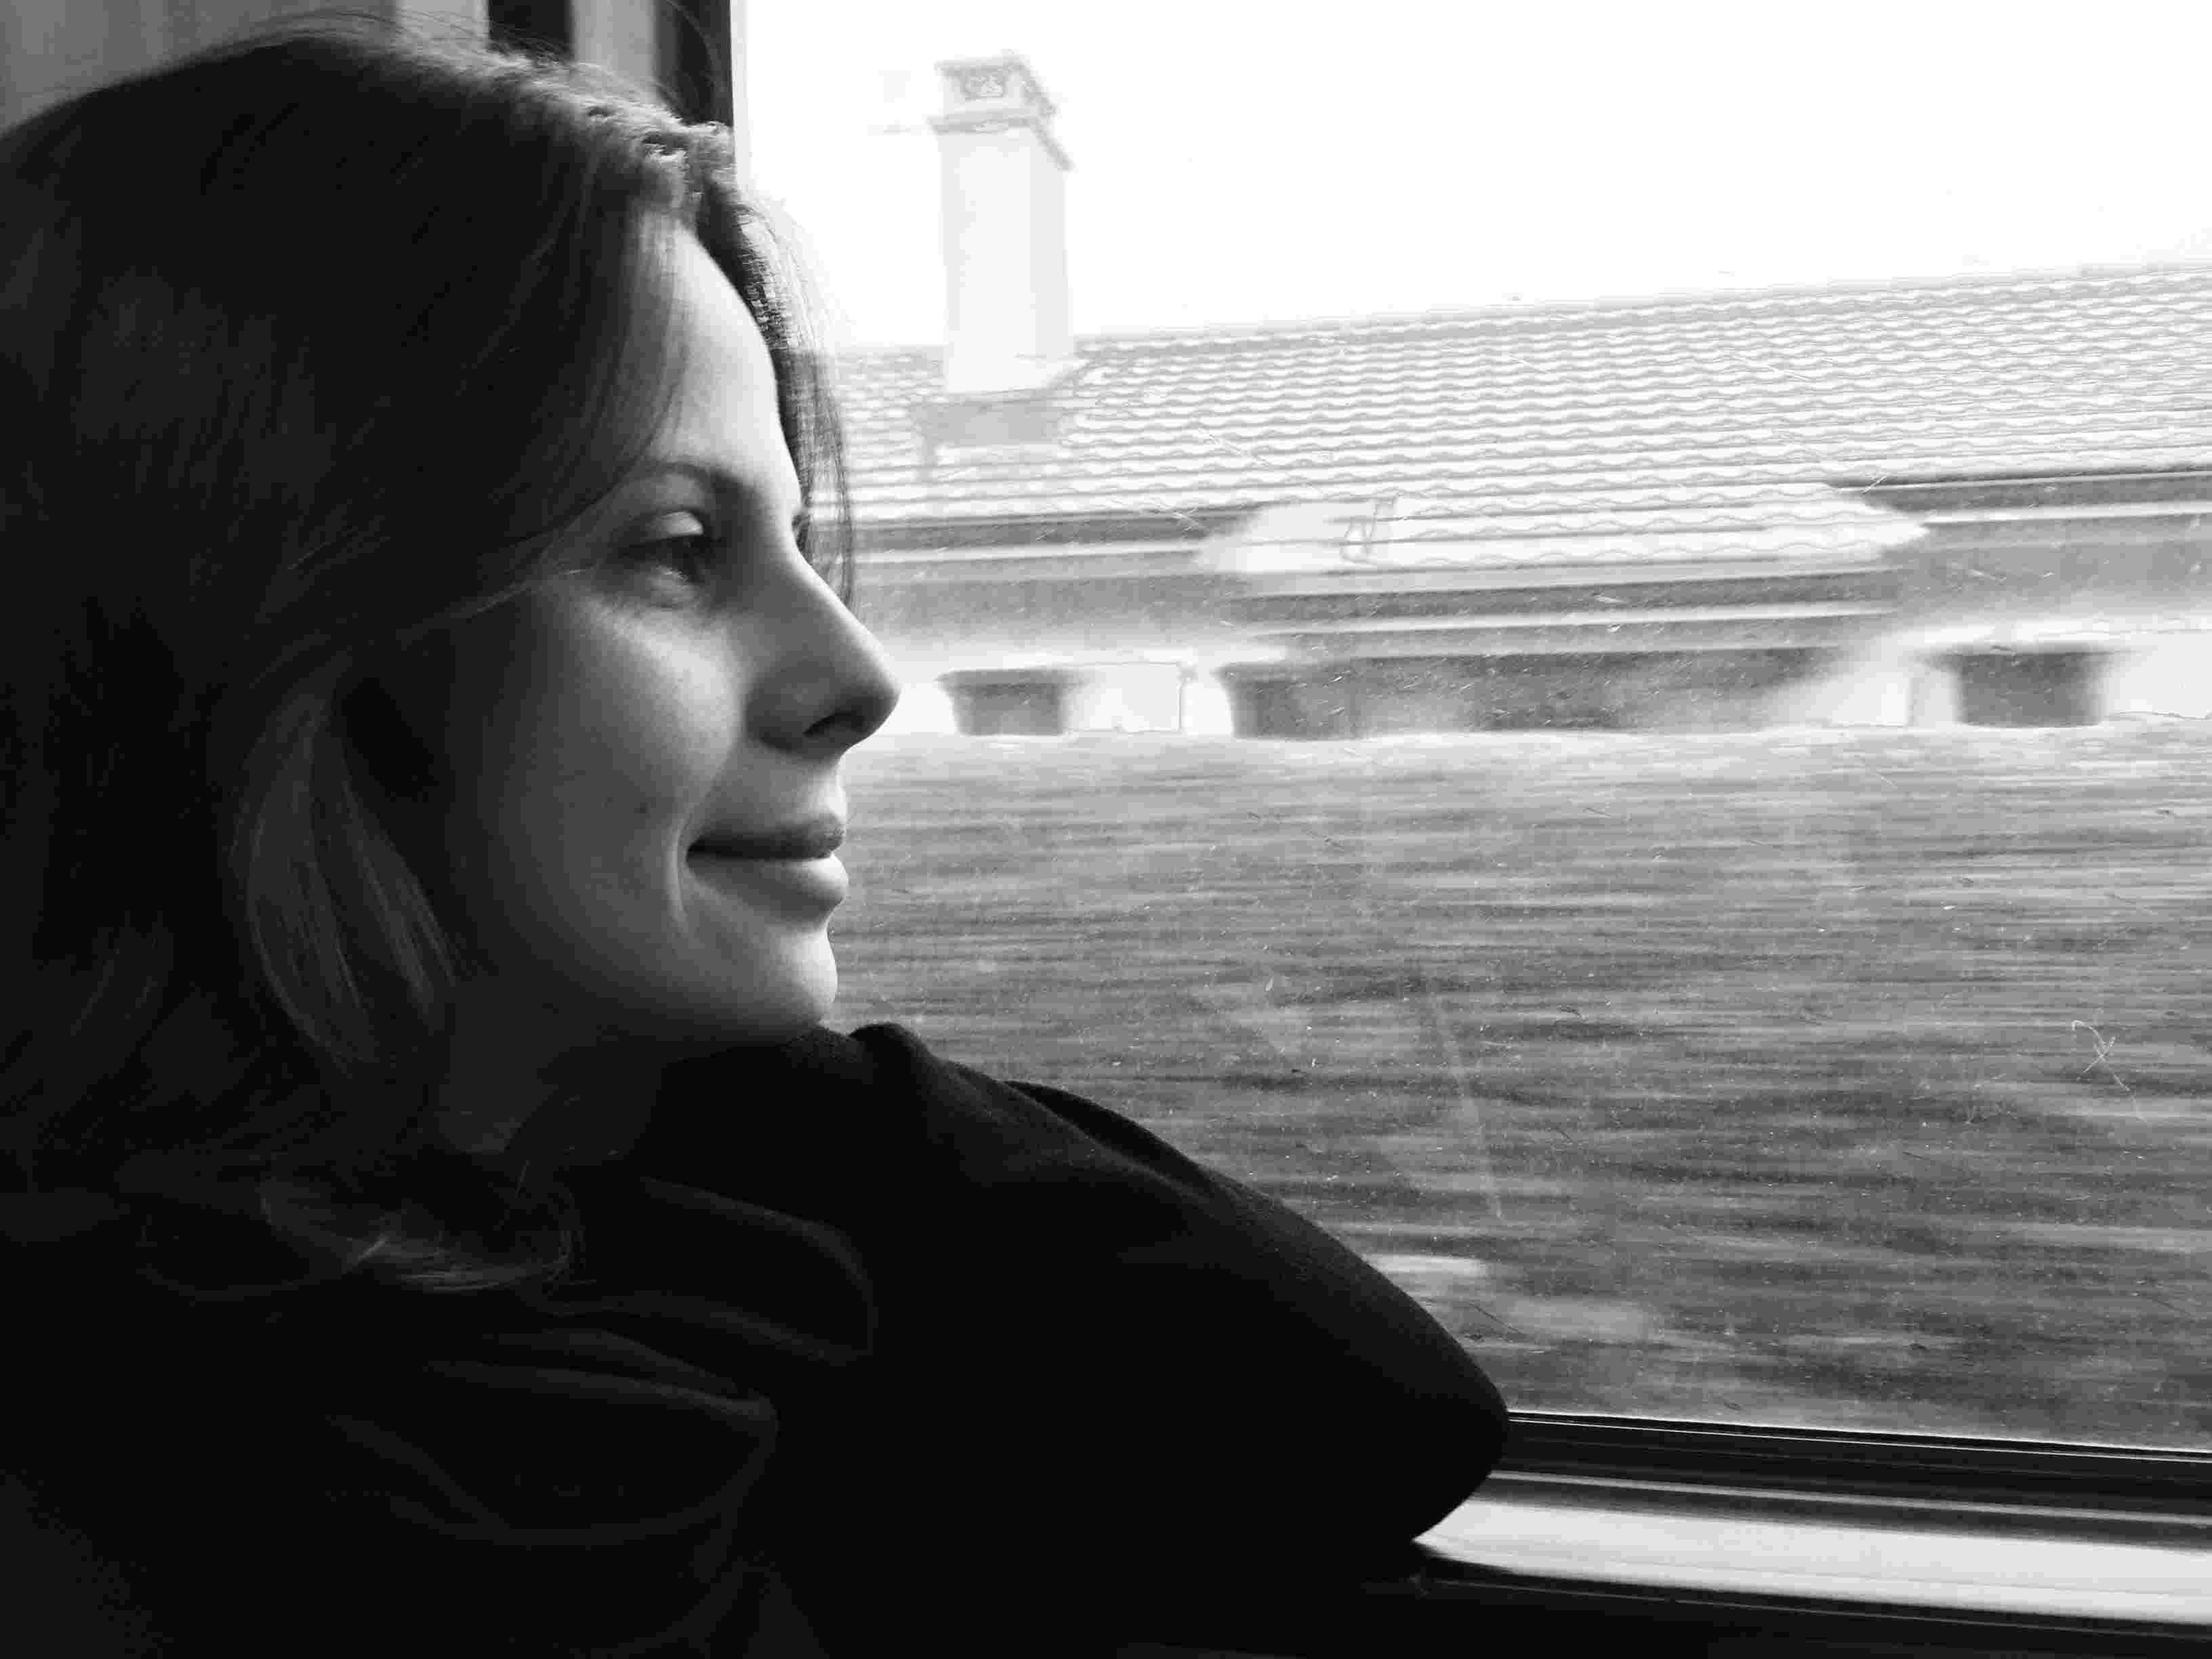 Marianne Macedo Martins